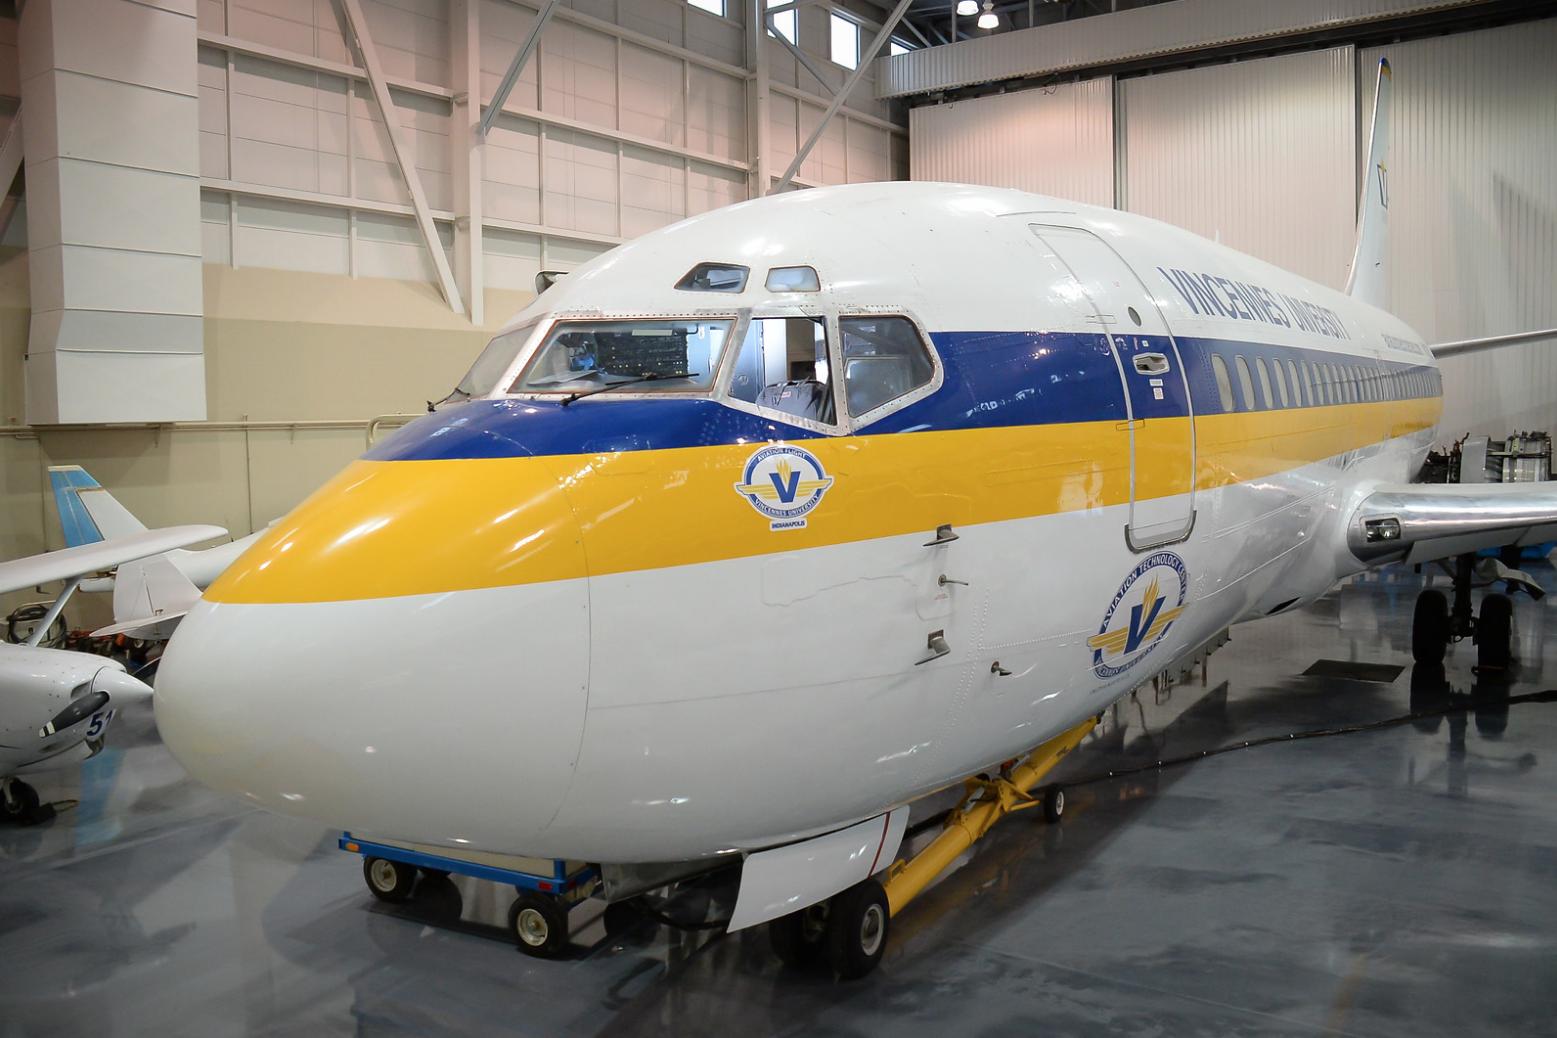 Aviation Maintenance Technology - Powerplant Add-on Certificate (CG)